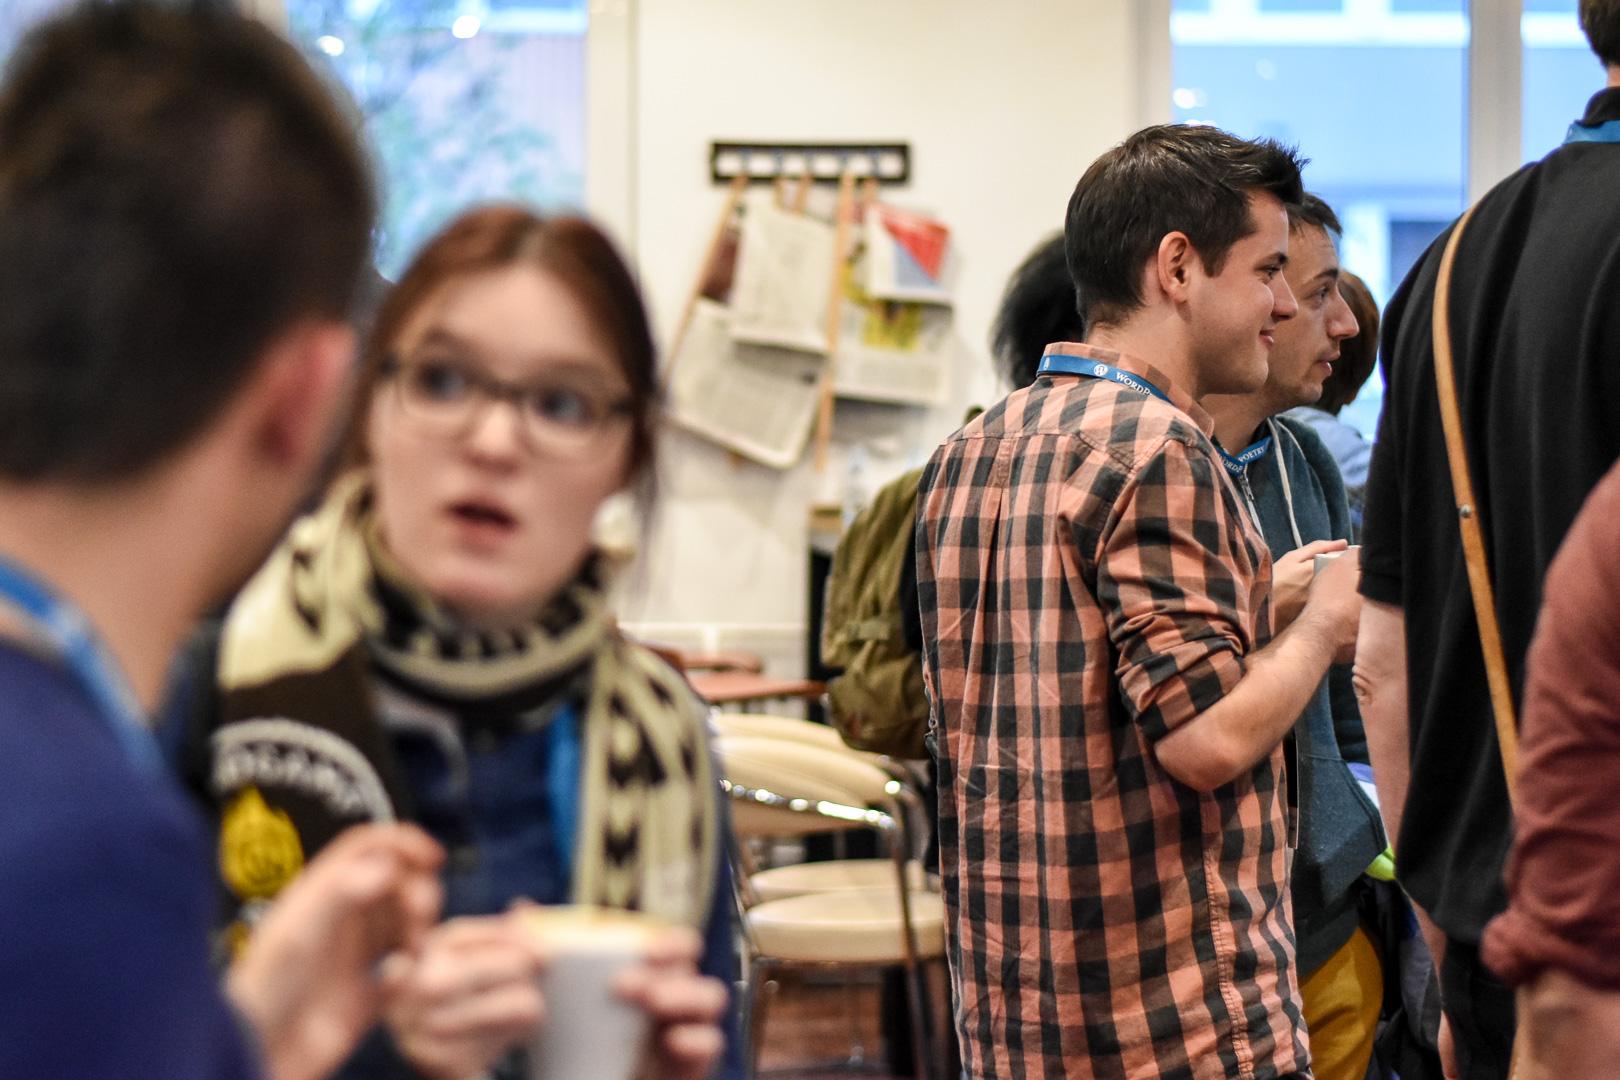 WordCamp Cologne, networking area, Dominik Schilling